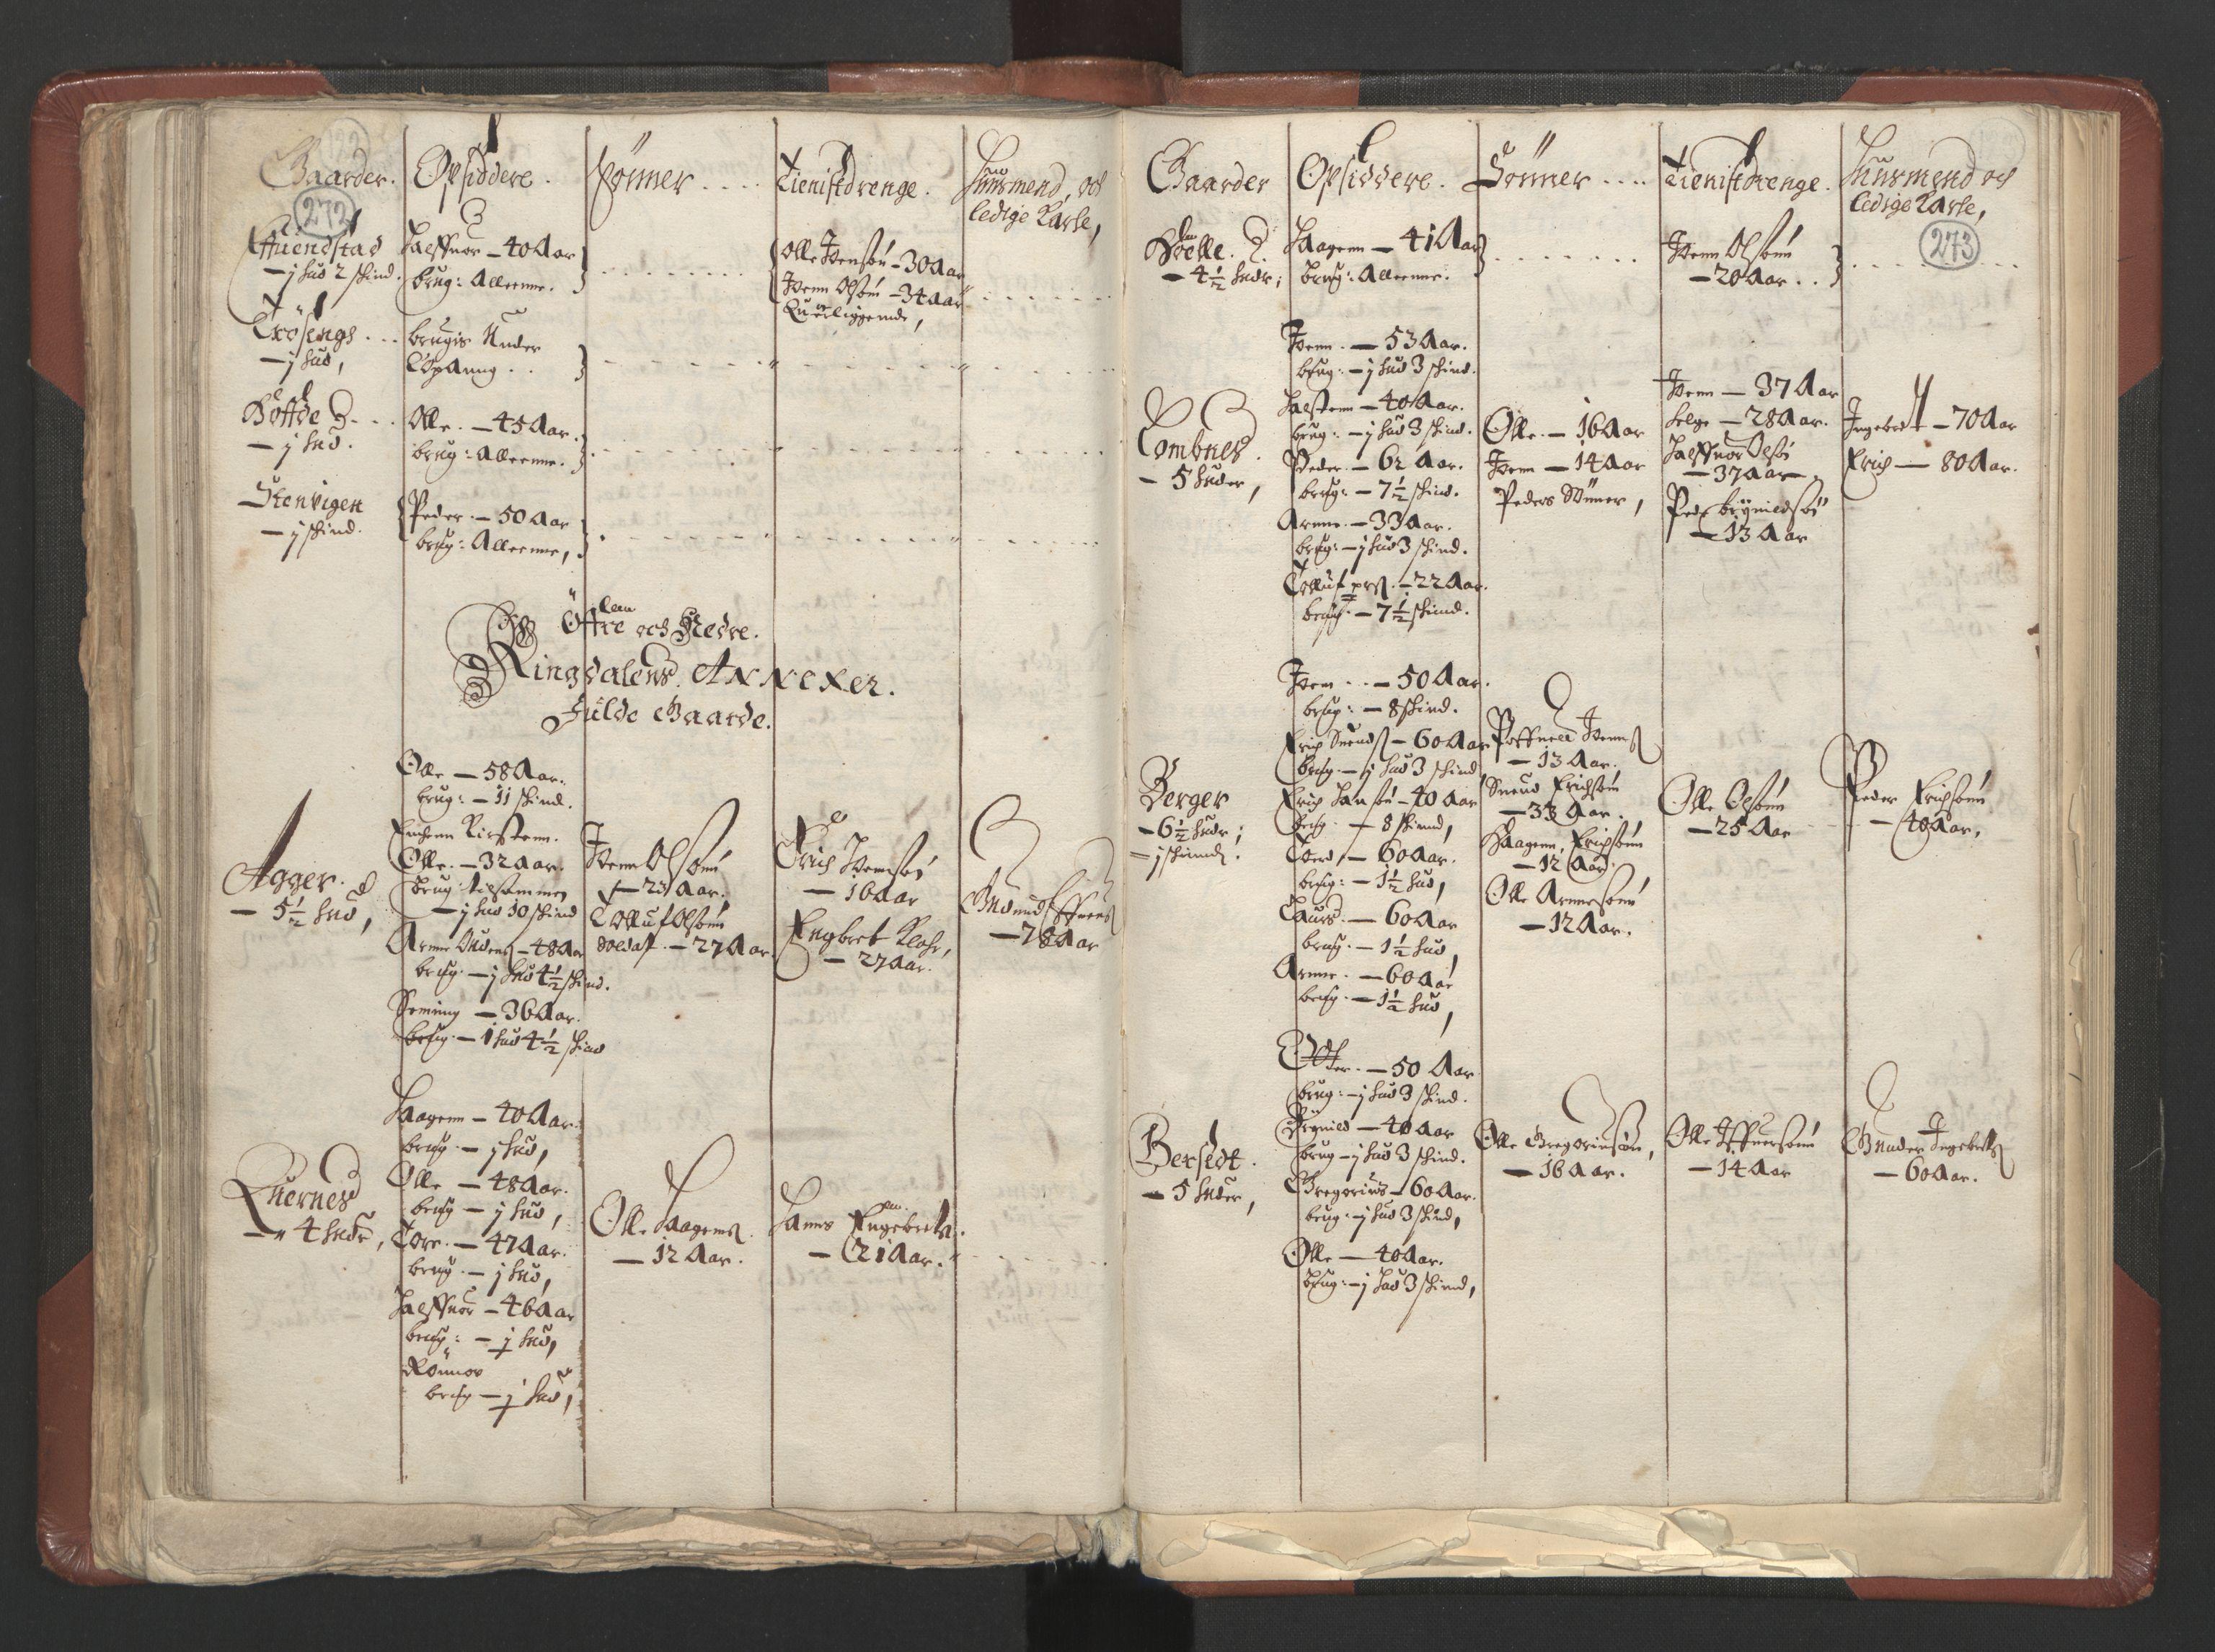 RA, Fogdenes og sorenskrivernes manntall 1664-1666, nr. 3: Hedmark fogderi og Solør, Østerdal og Odal fogderi, 1664, s. 272-273